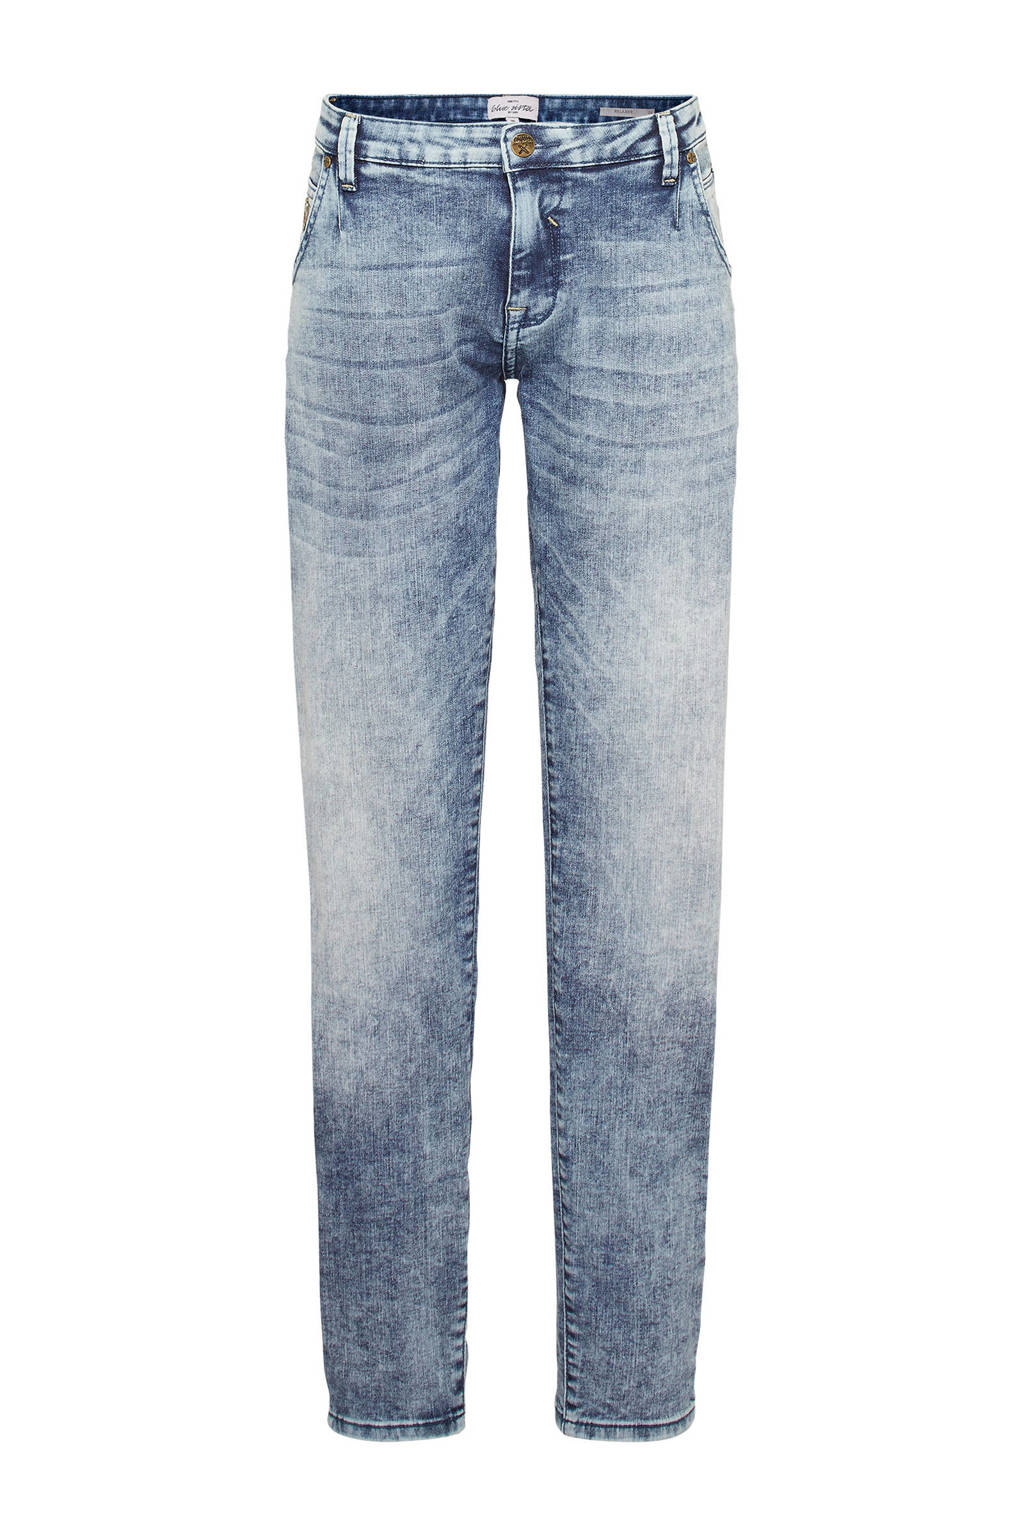 Didi loose fit jeans, Lightdenim